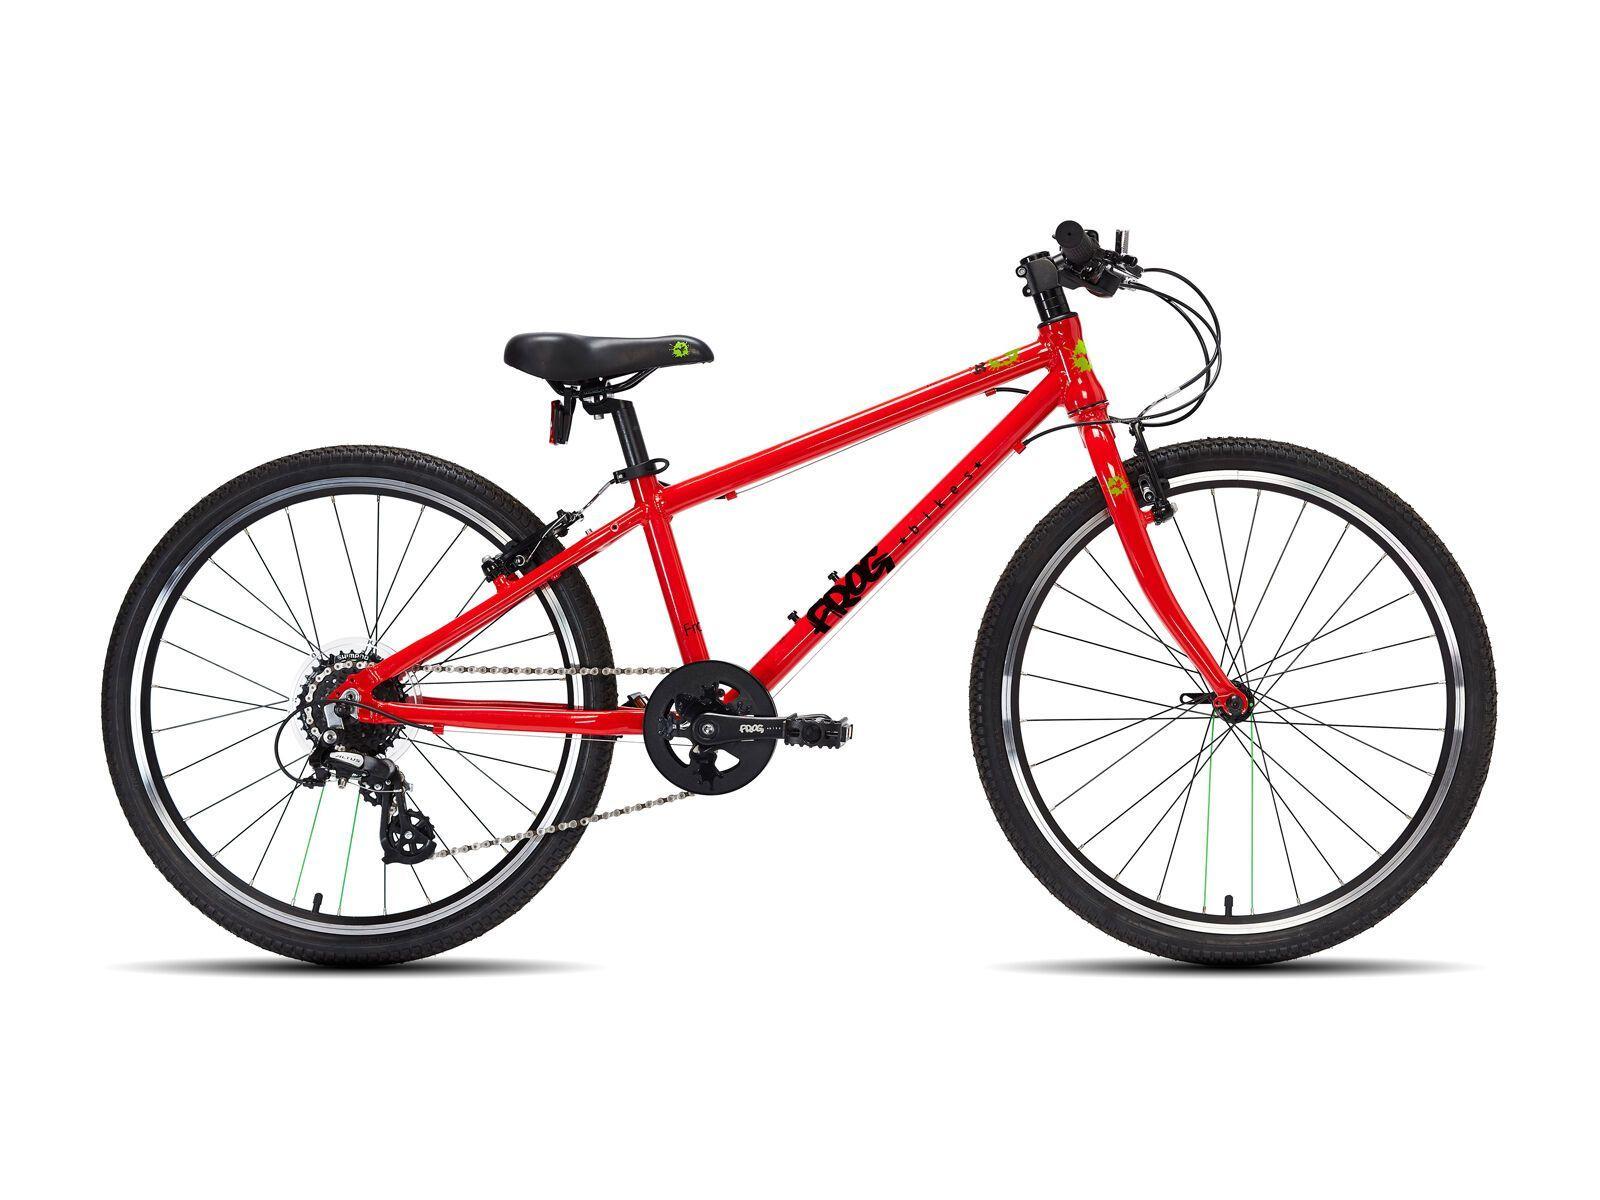 Frog Bikes Frog 62 red 2021 30.5 cm FR6201RED